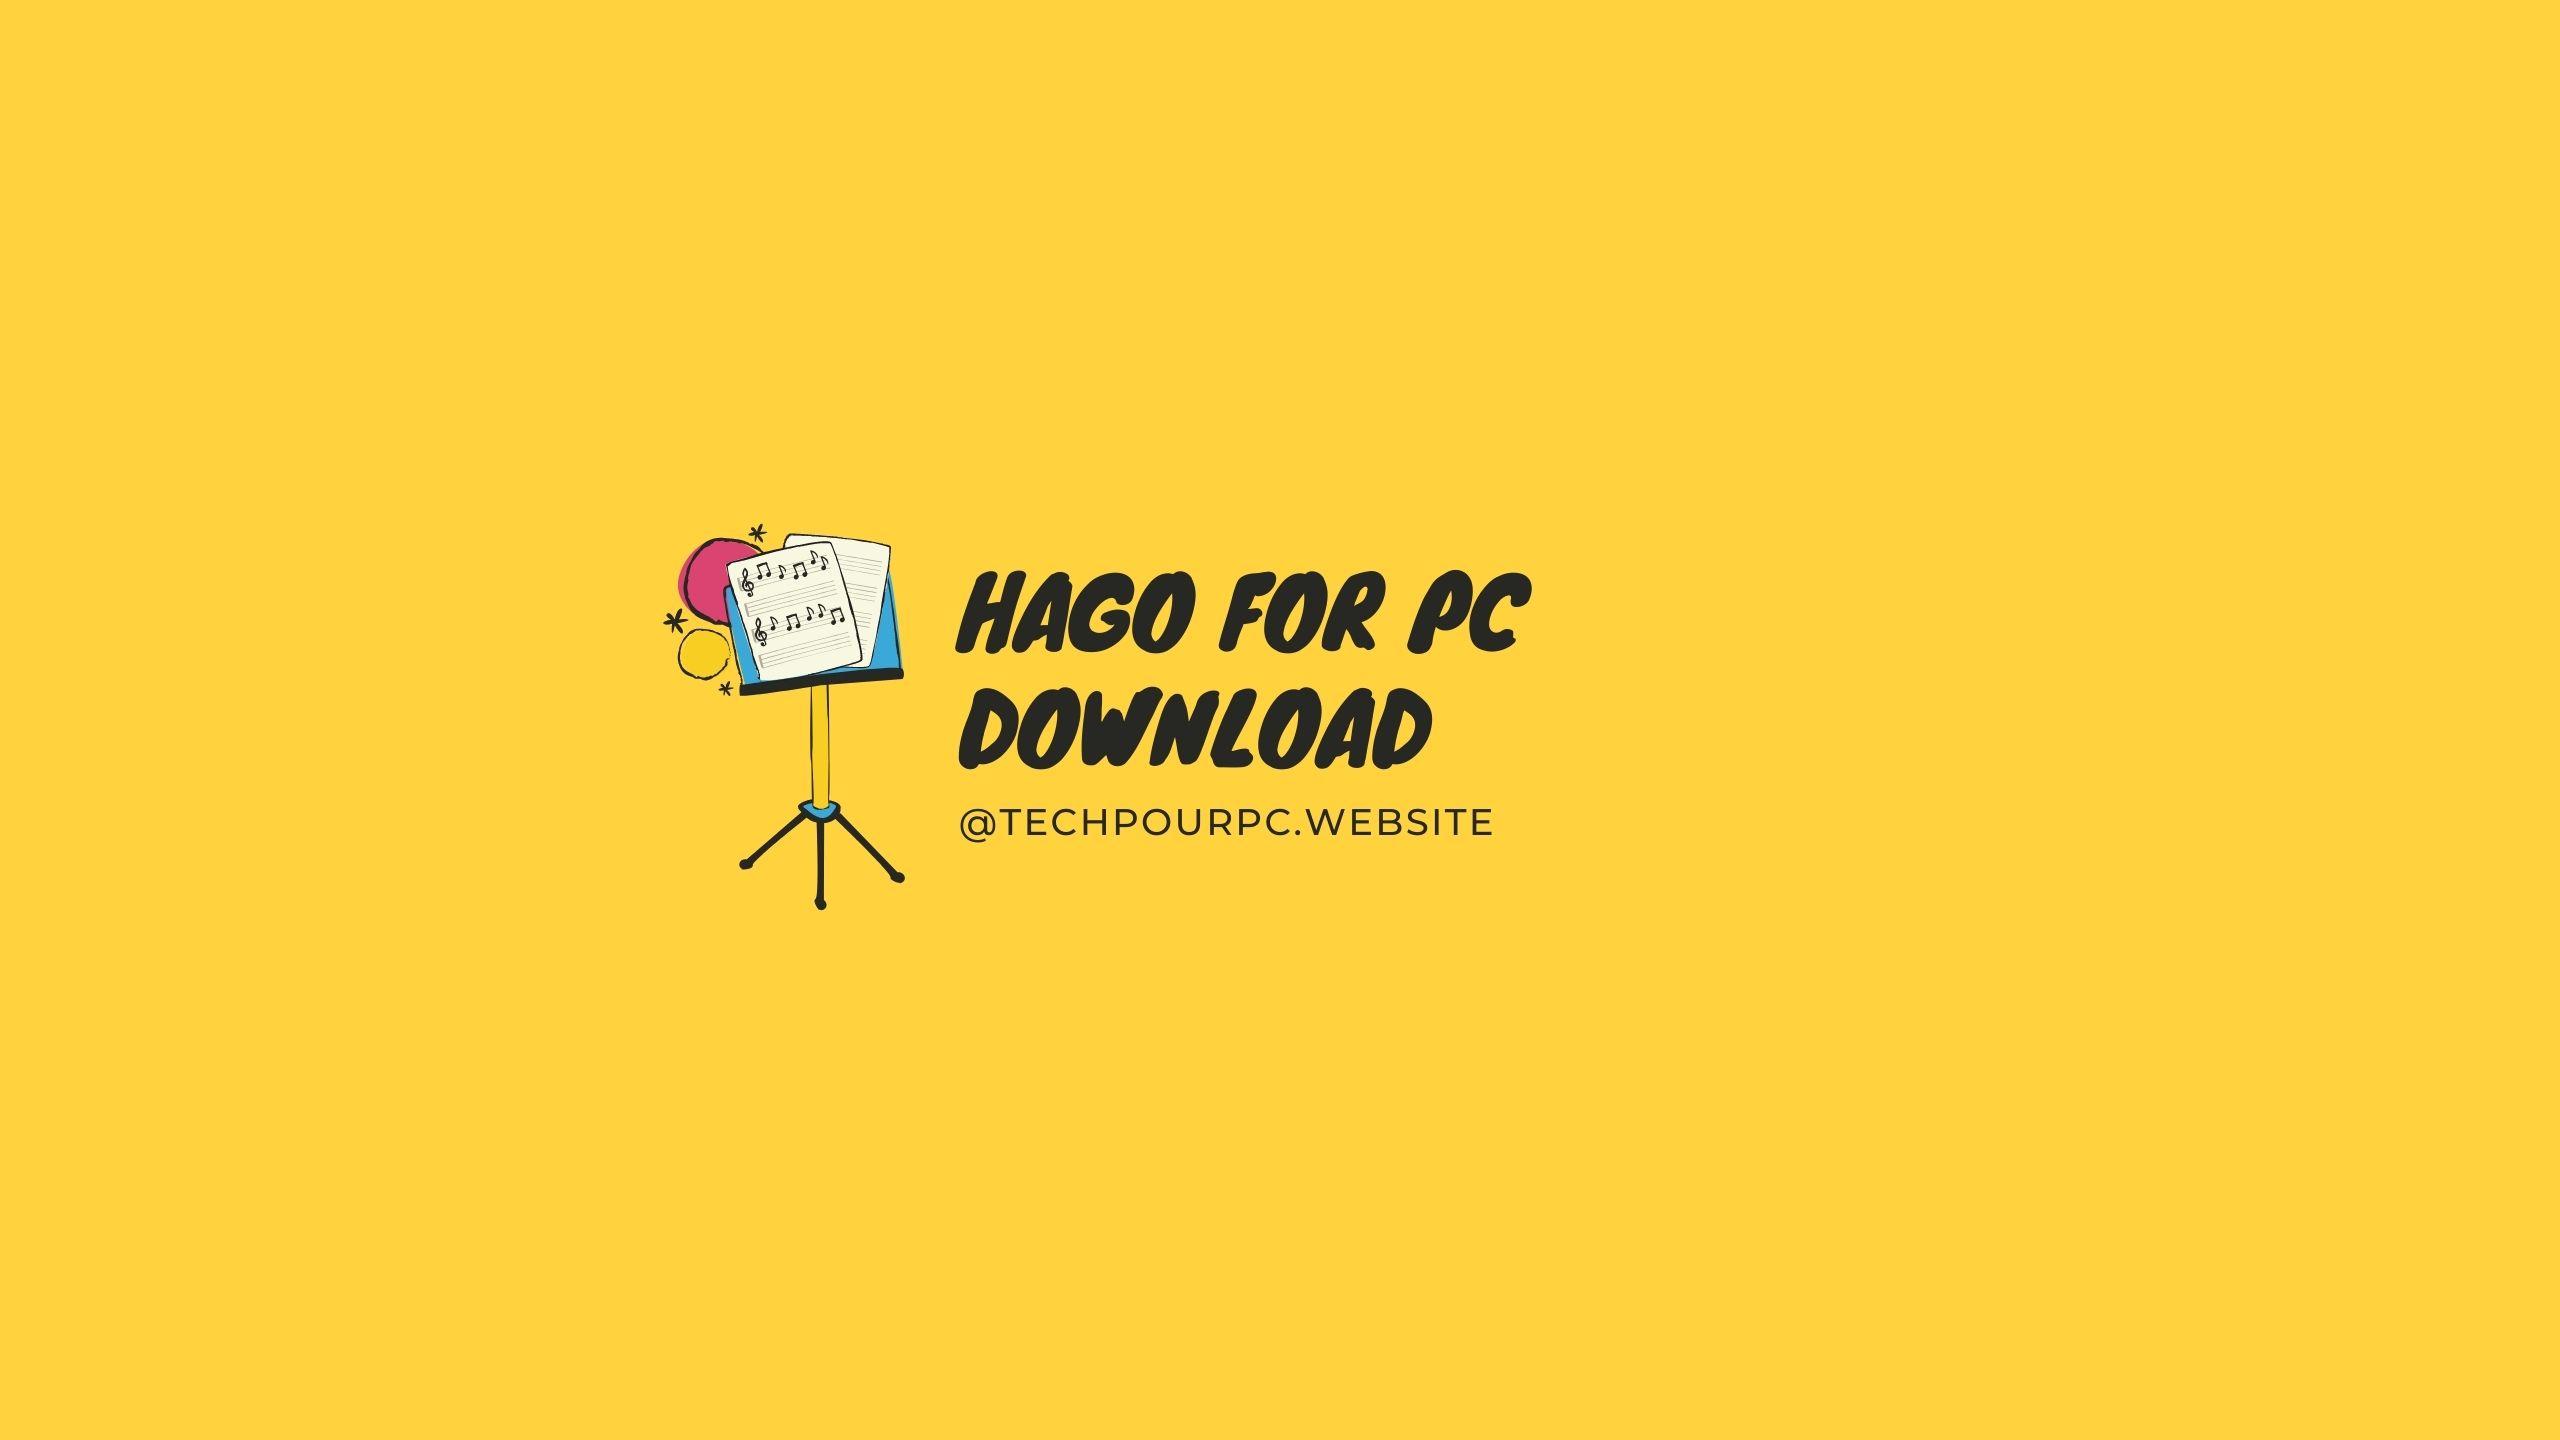 Hago for PC Download